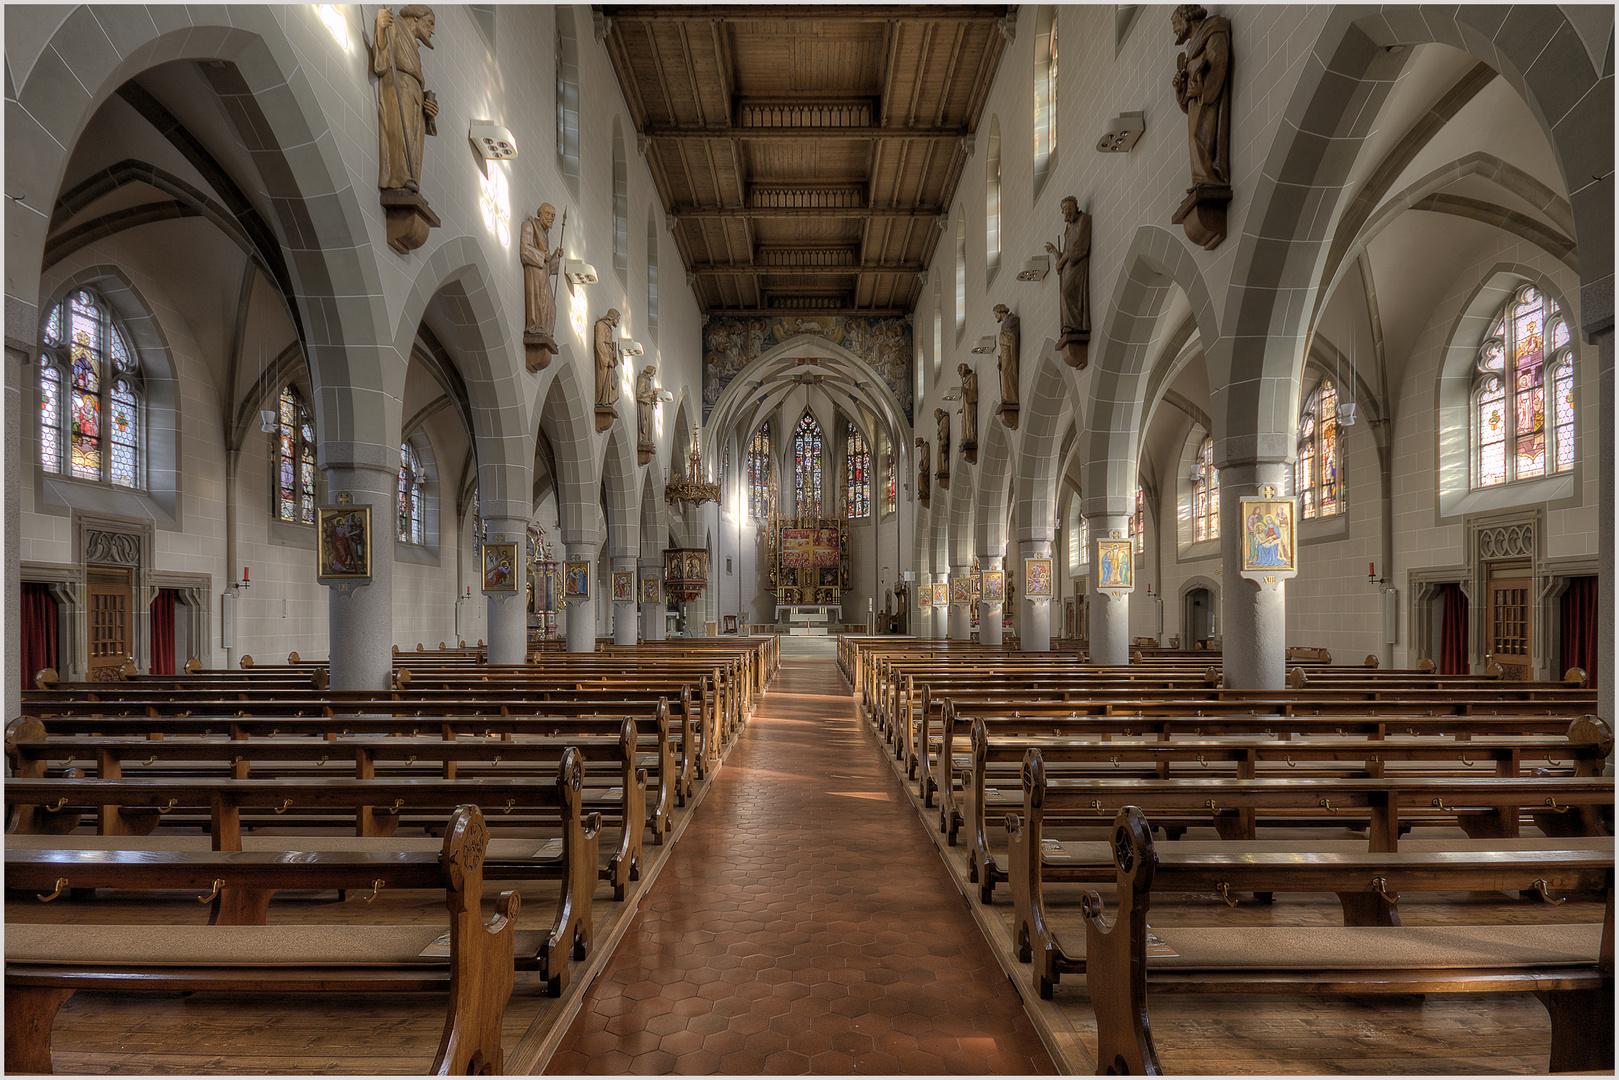 Kappelrodeck-St. Nikolaus Kirche